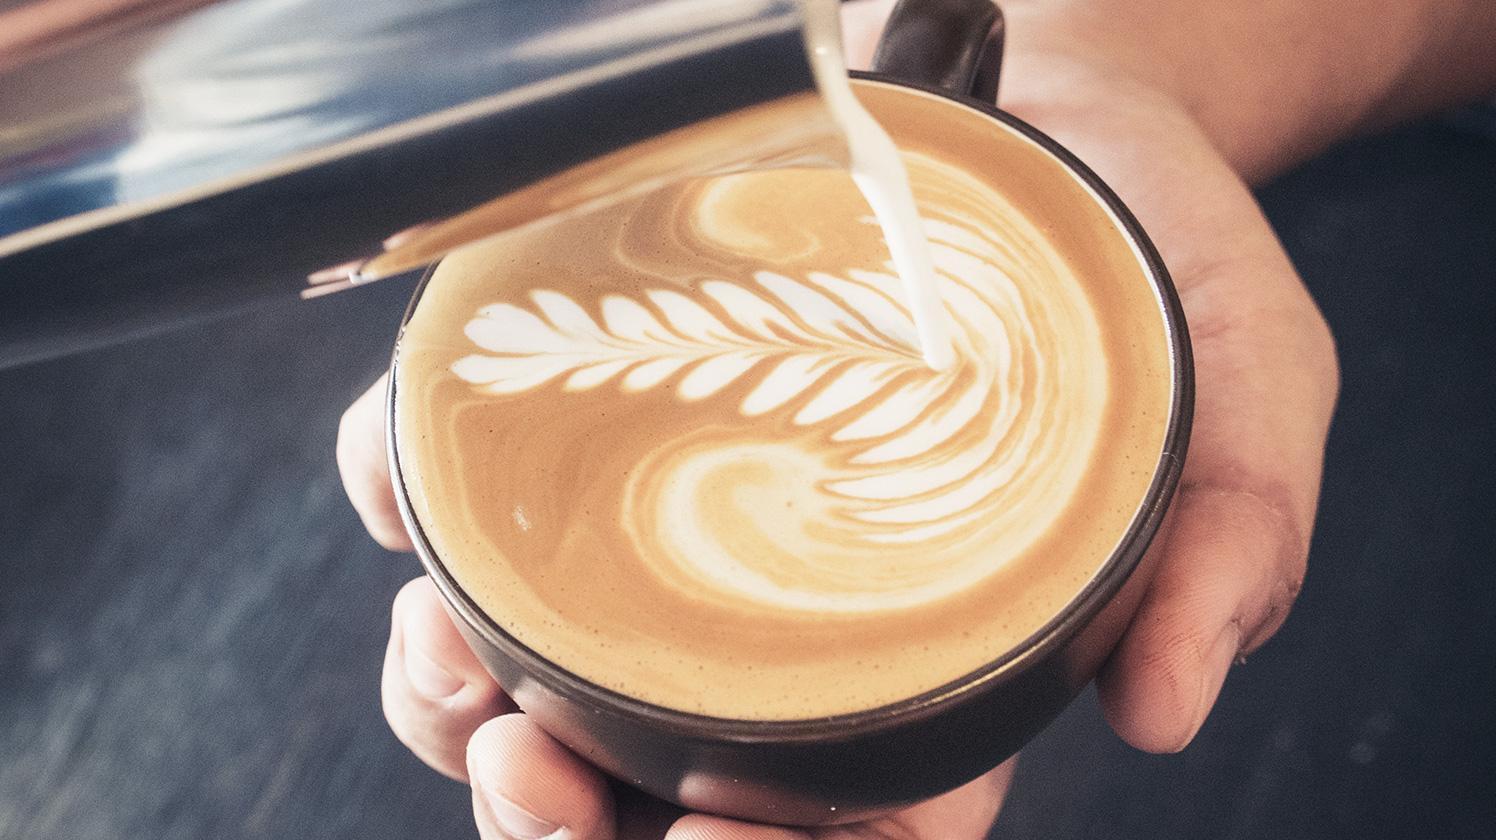 BRITA filter AquaGusto coffee crema cappuccino art